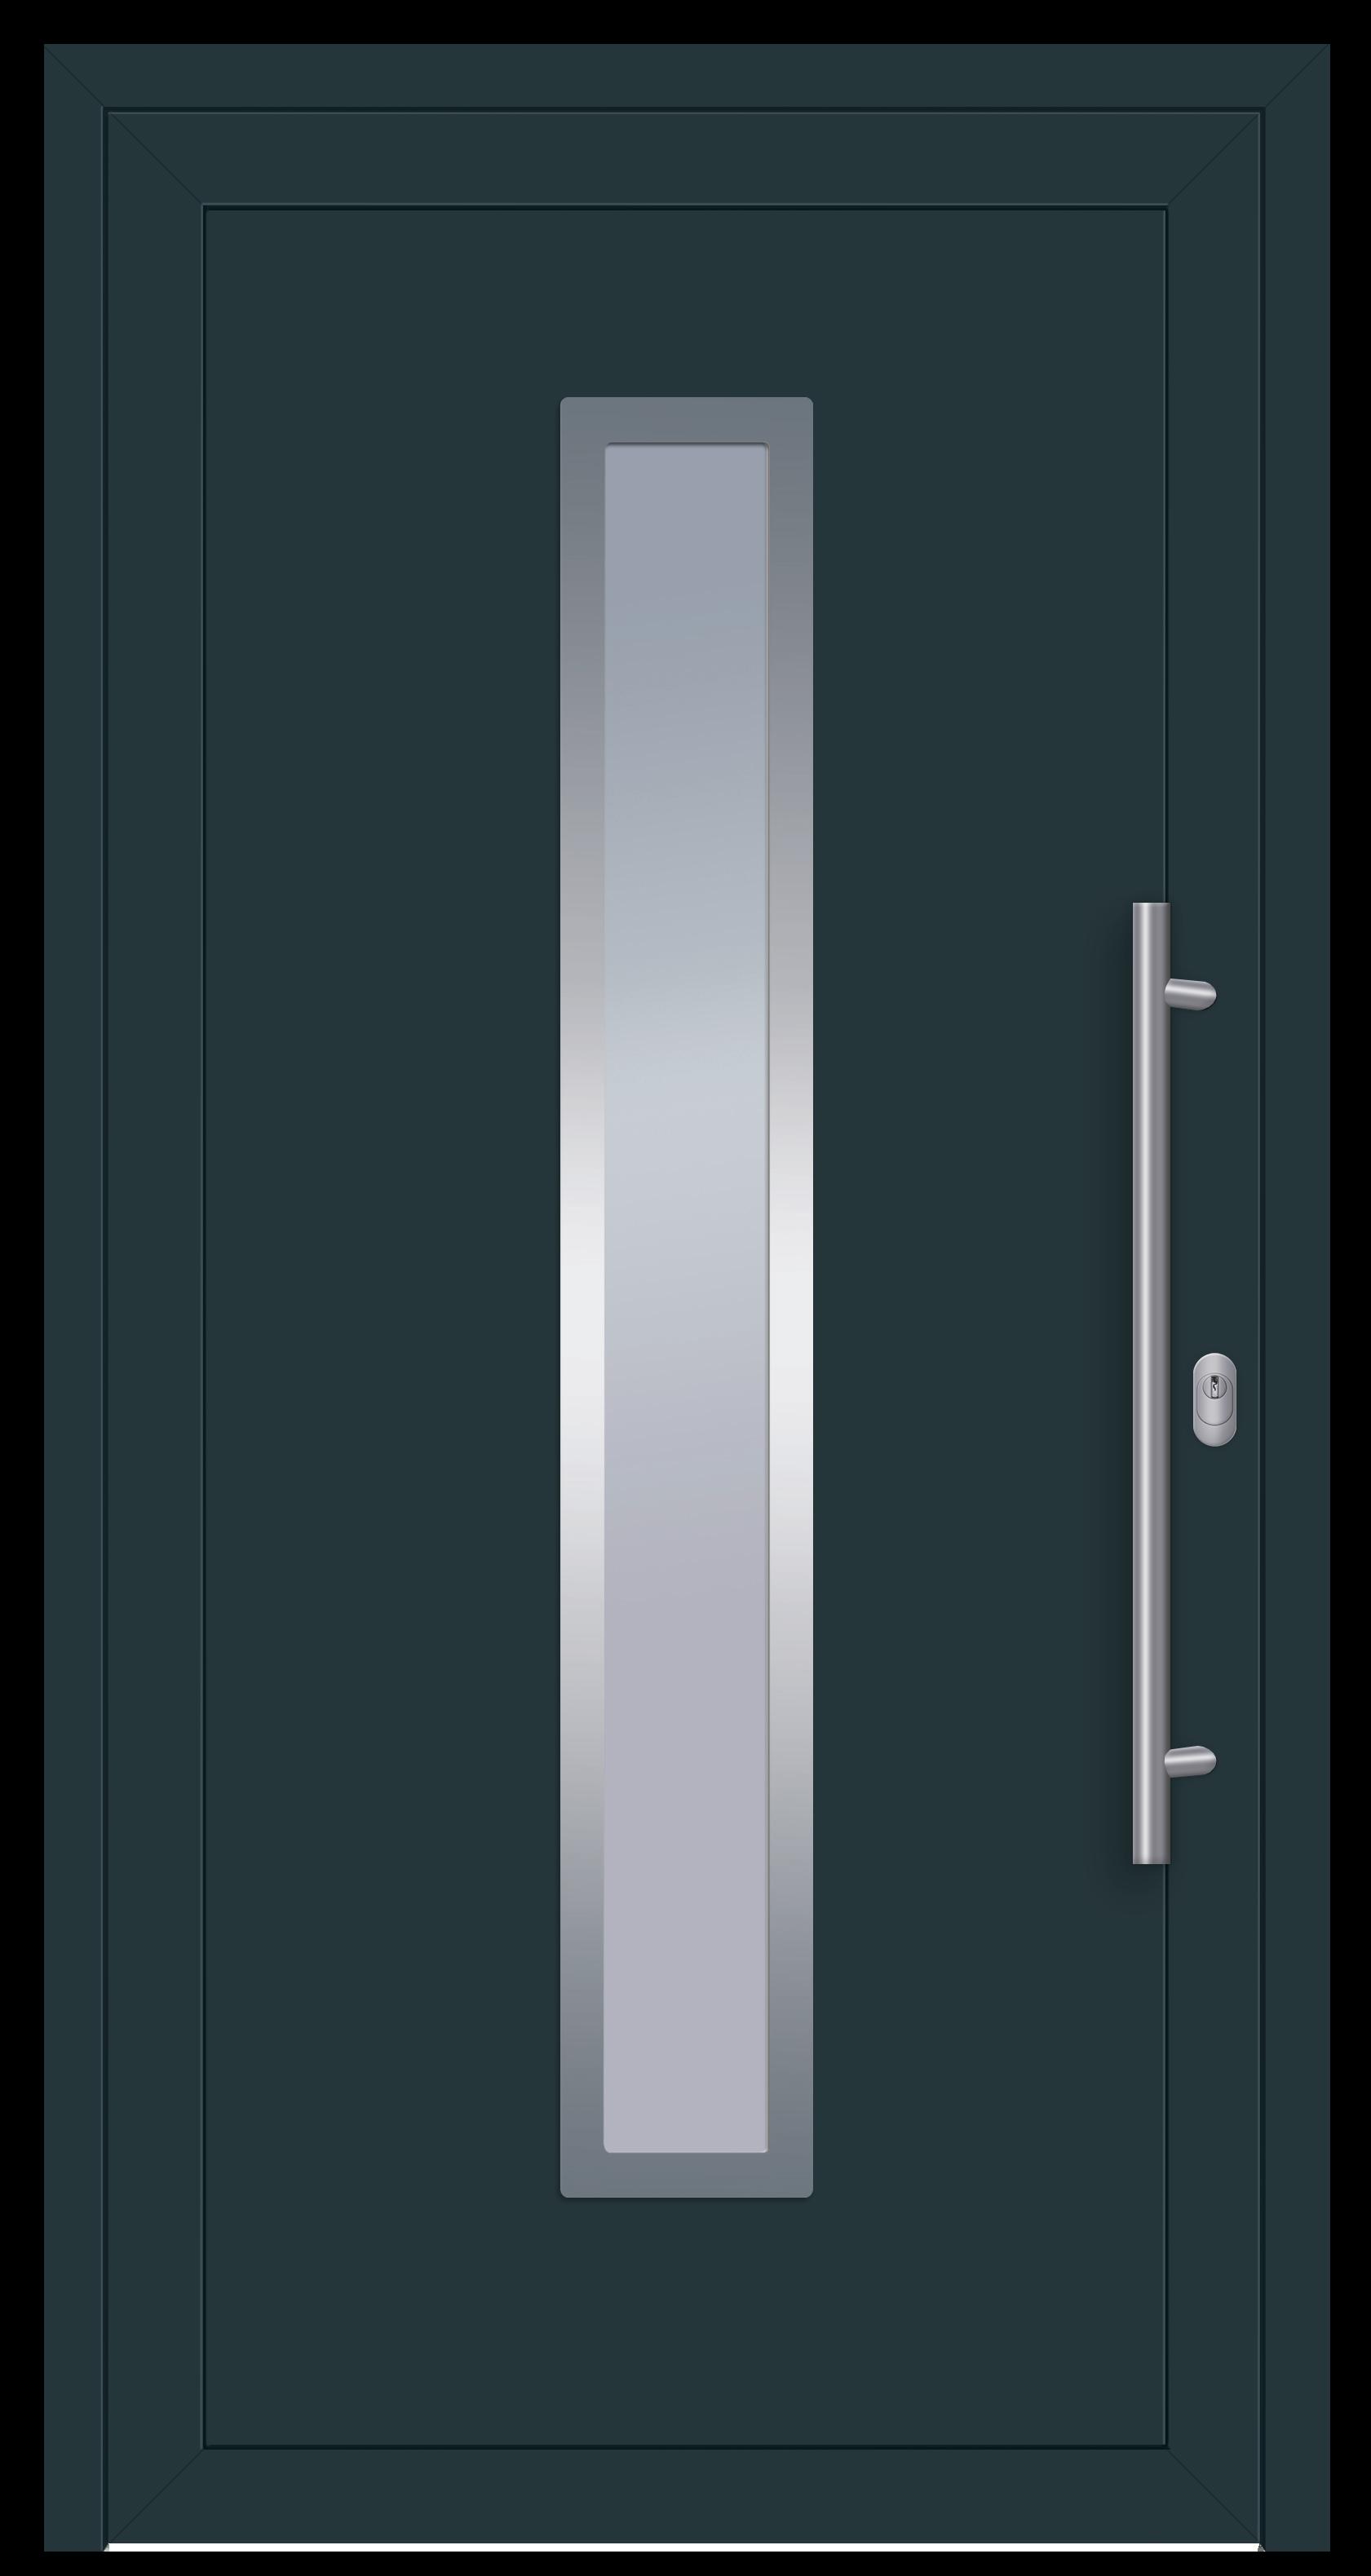 S001 Linie_Speed Aluminiumhaustür beidseitig Ral 7016